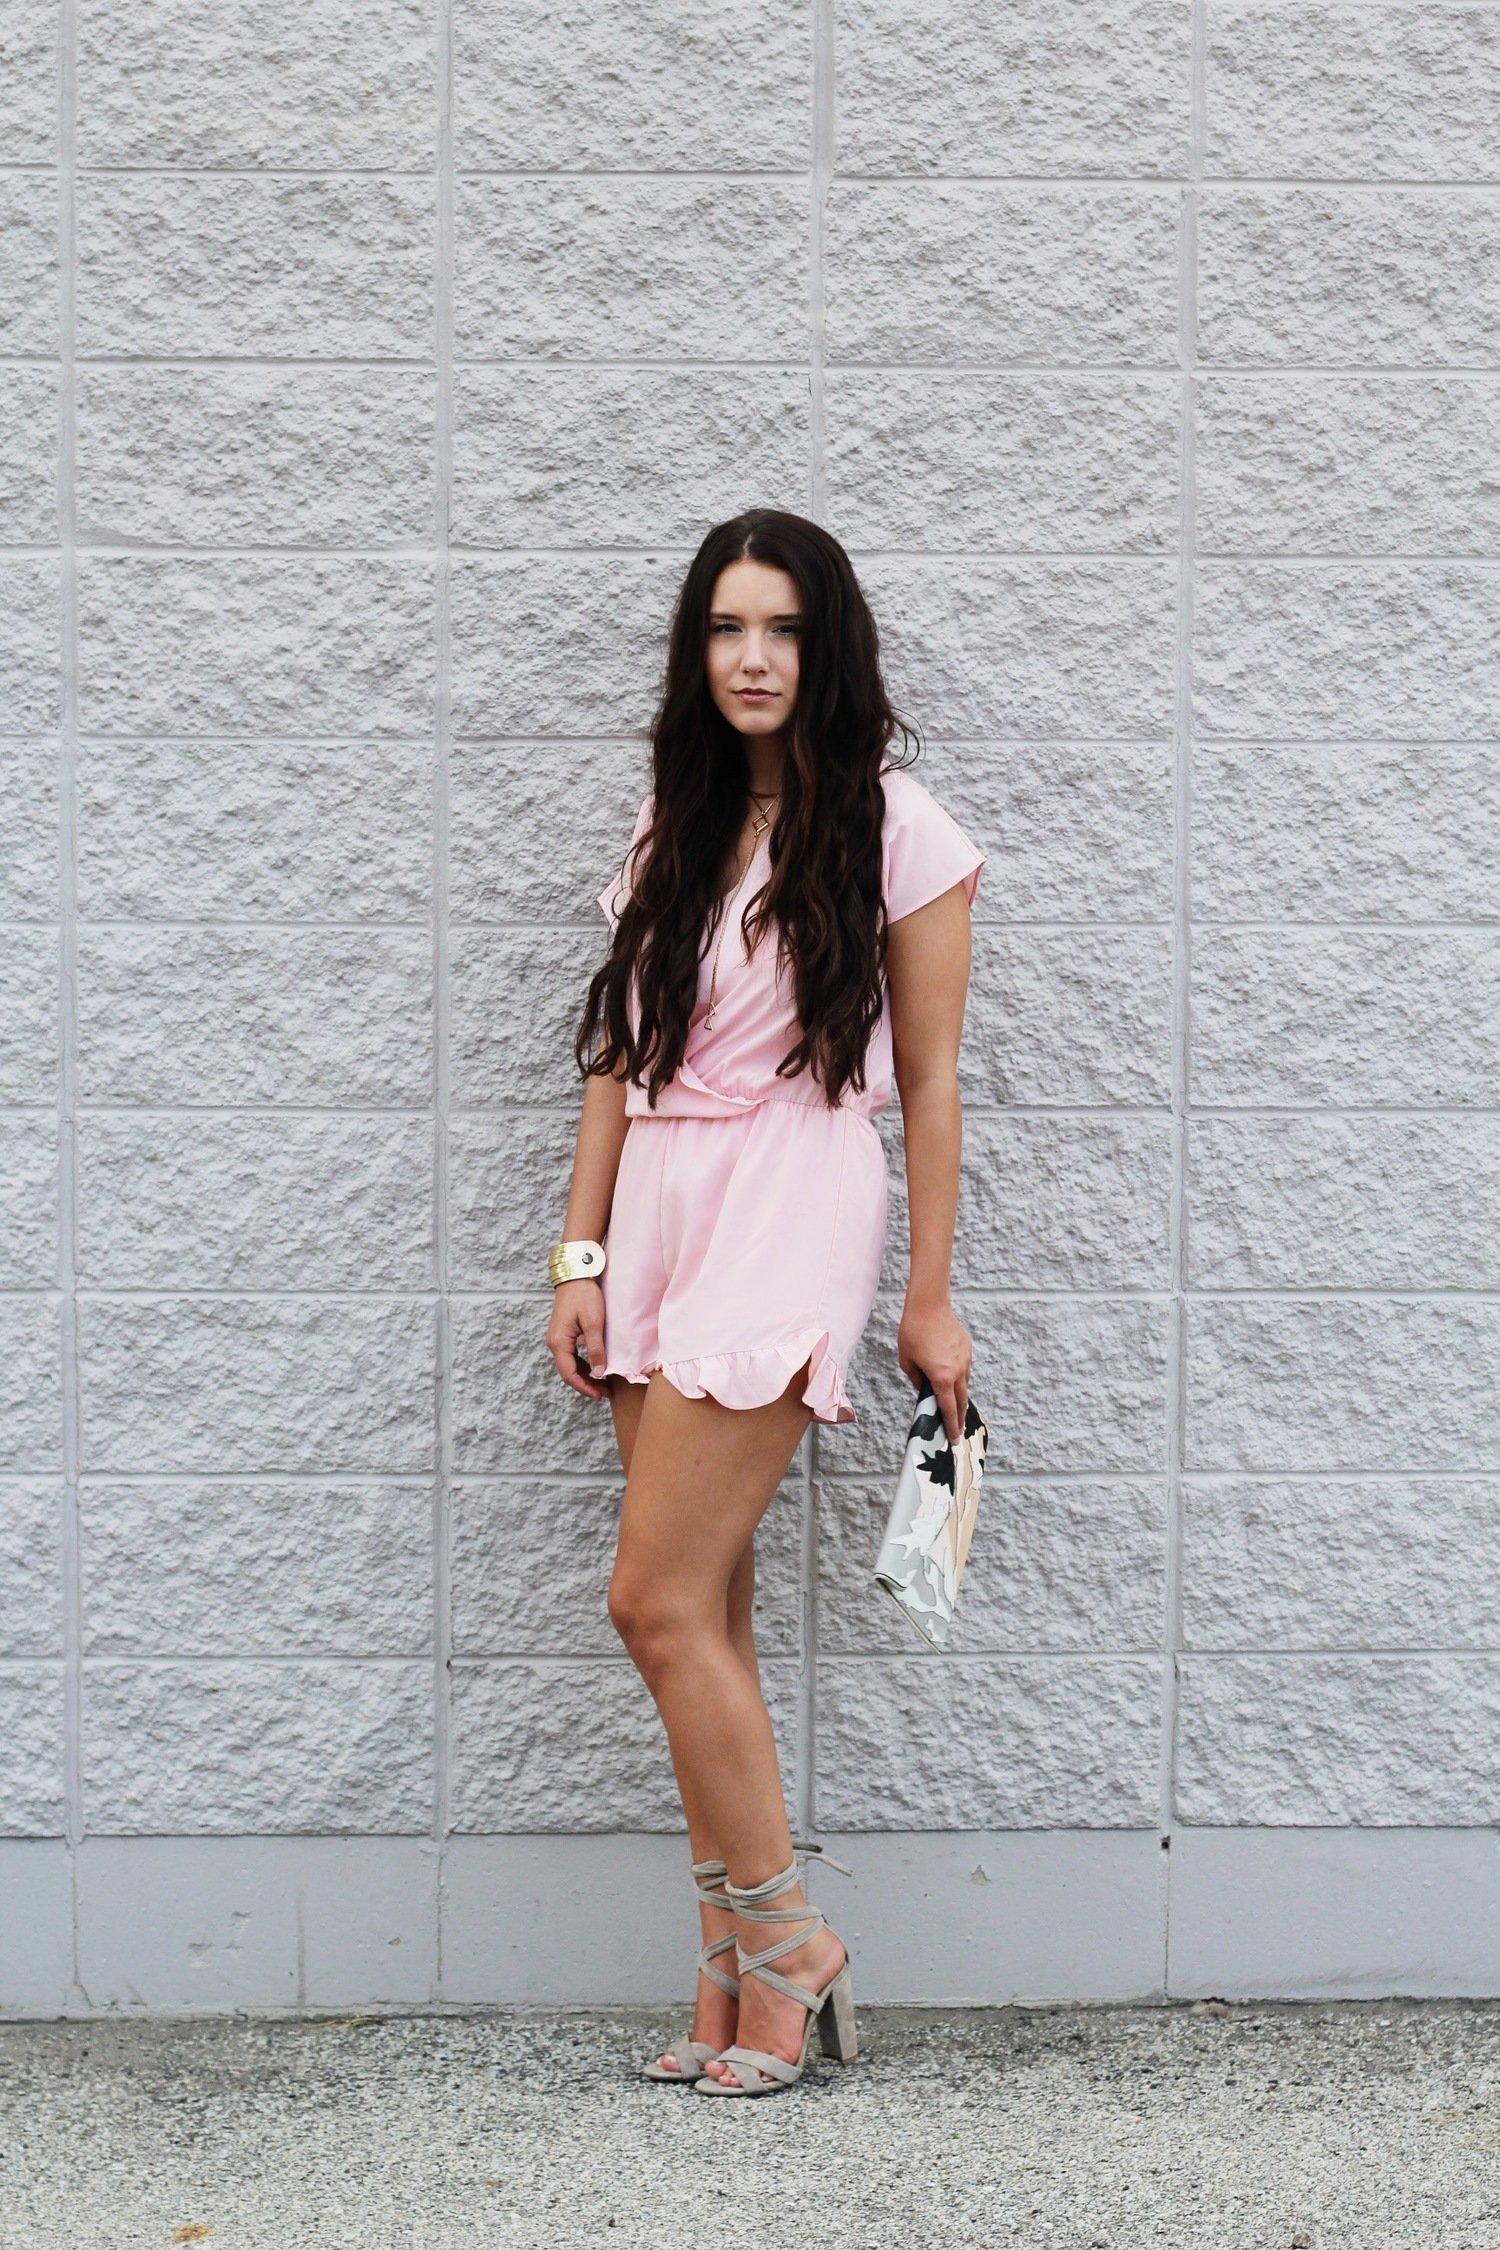 style-on-edge-raelynns-boutique-bubblegum-romper-3.jpg